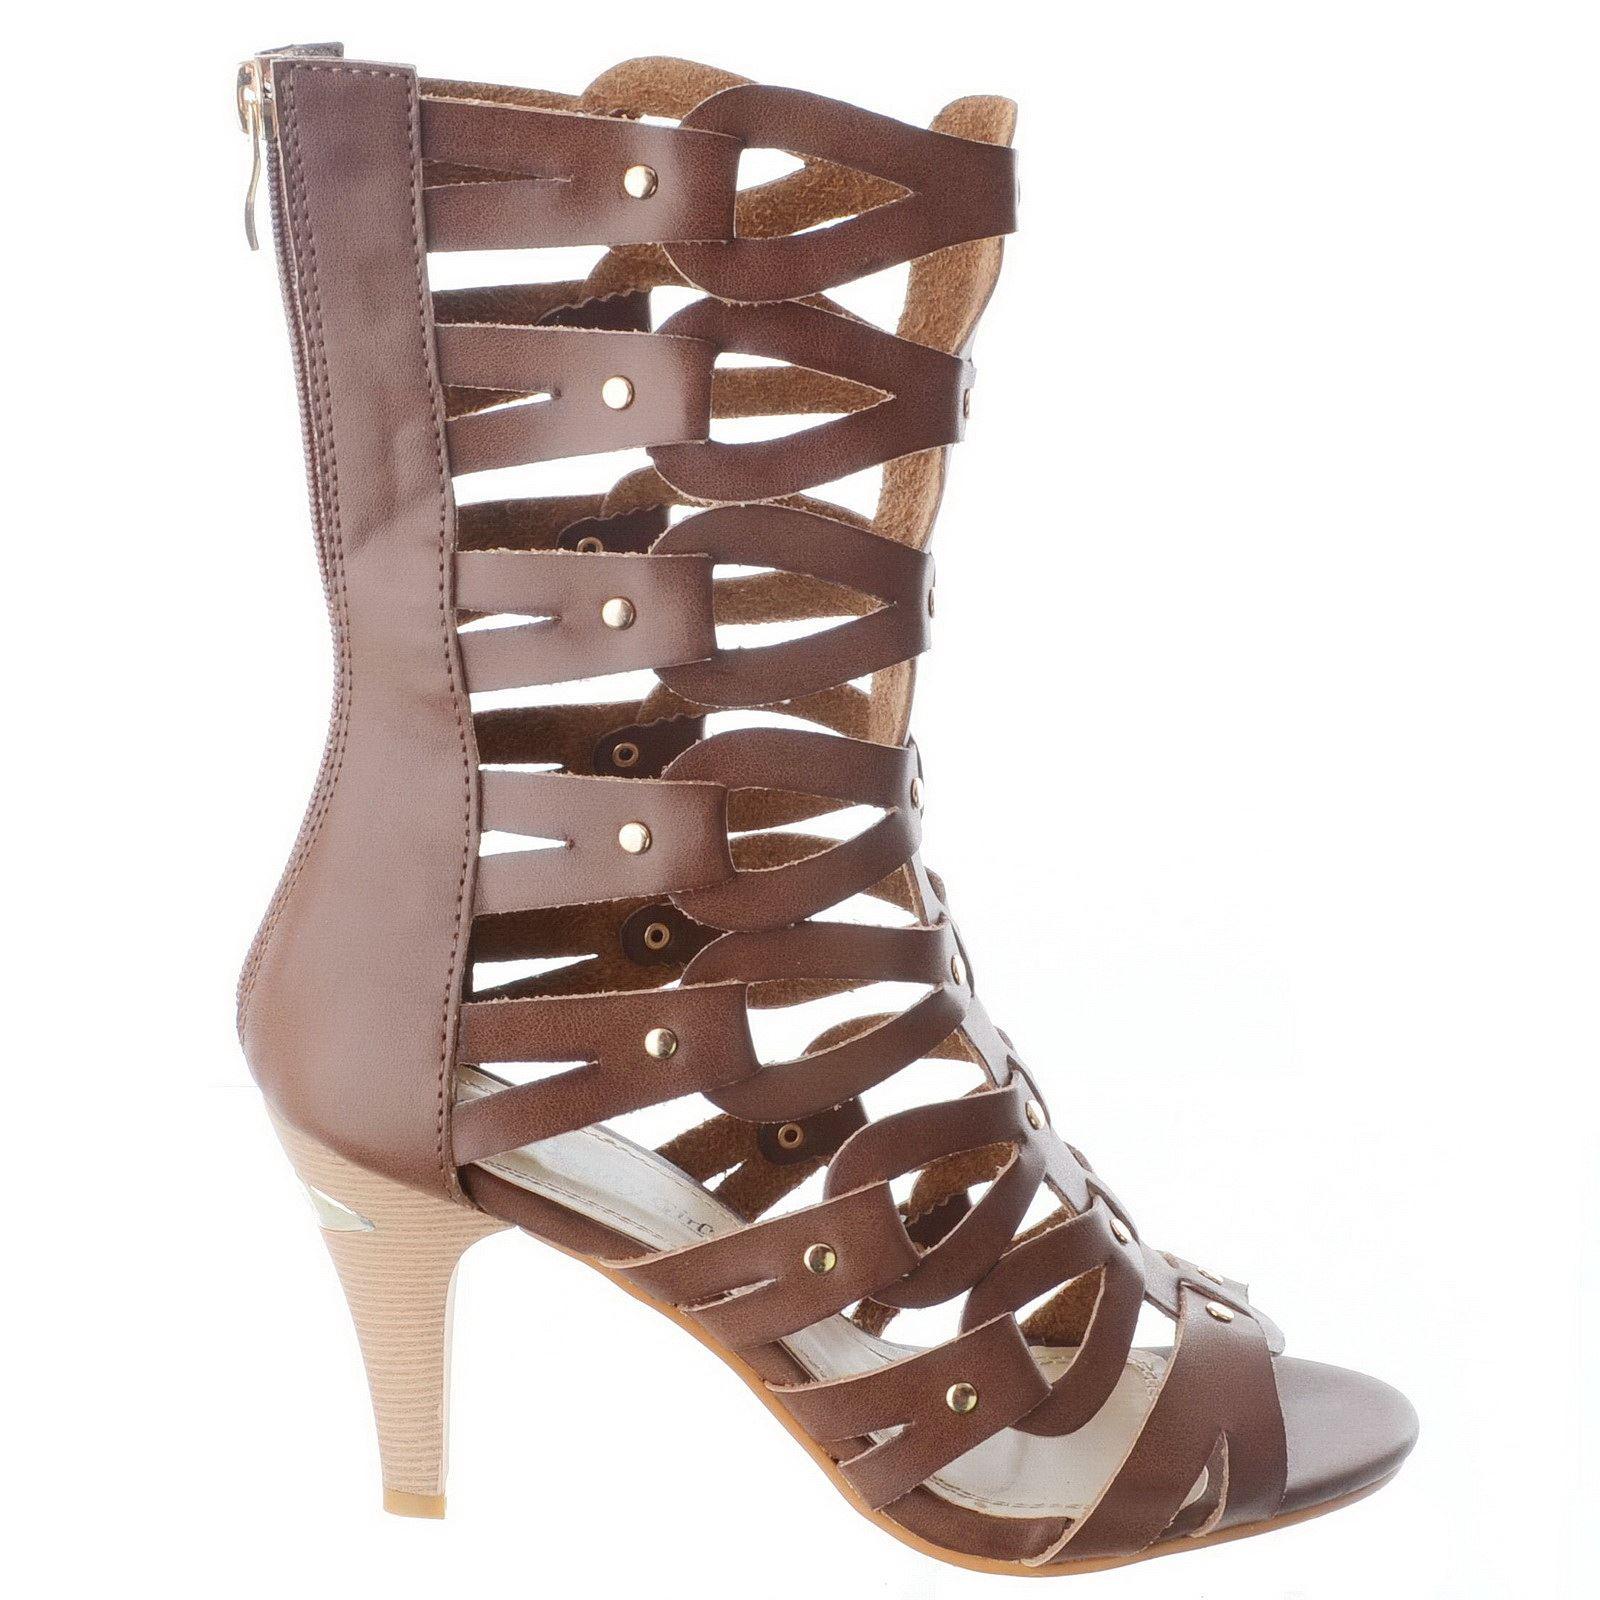 Gladiator Mid Heel Shoes